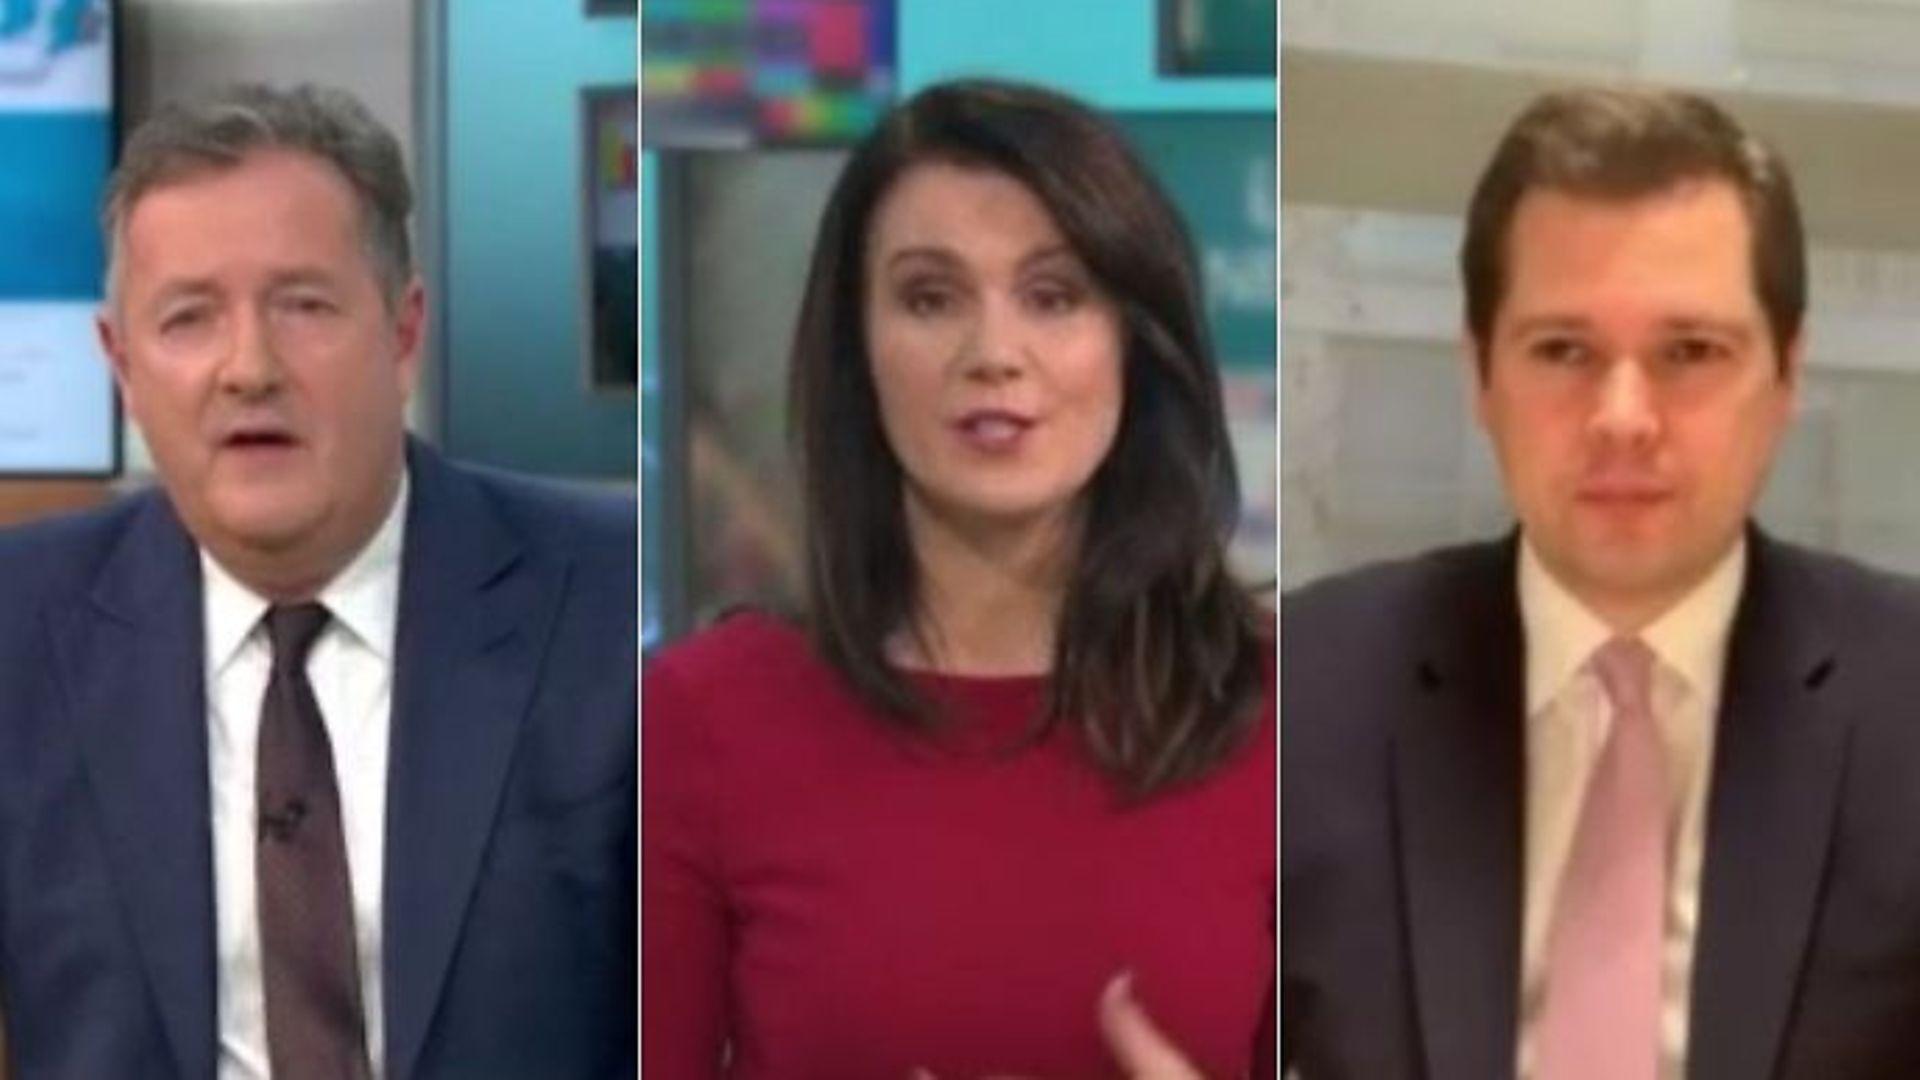 Communities secretary Robert Jenrick interviewed by Susanna Reid and Piers Morgan - Credit: ITV